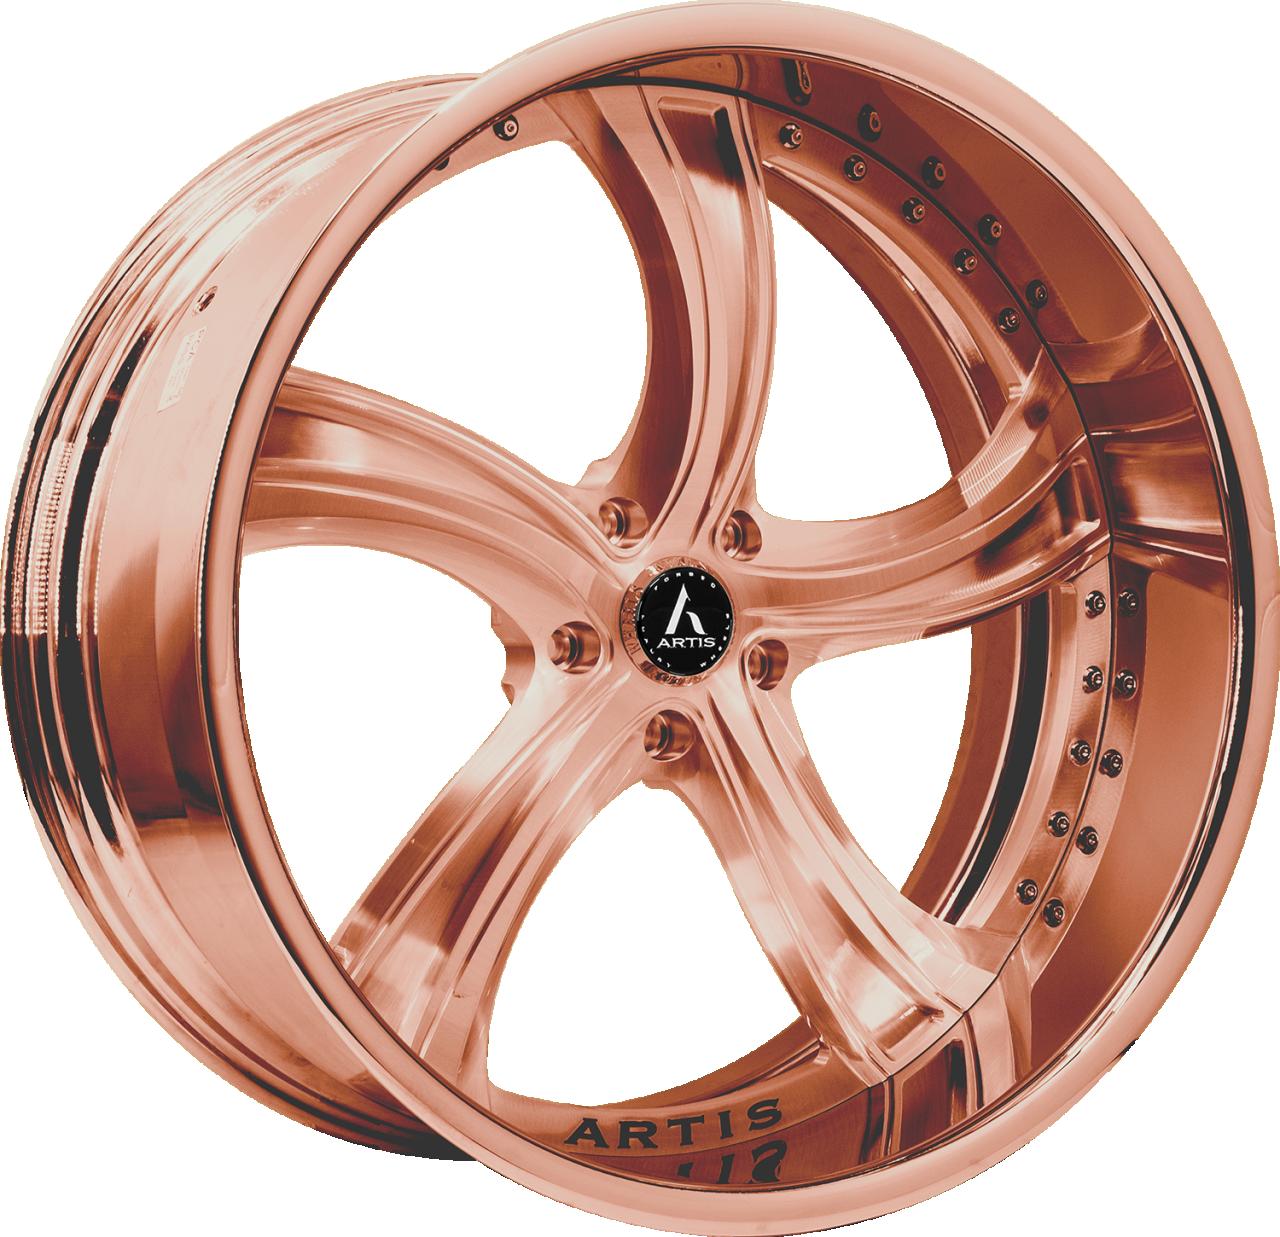 Artis Forged Kokomo wheel with Custom Rose Gold finish